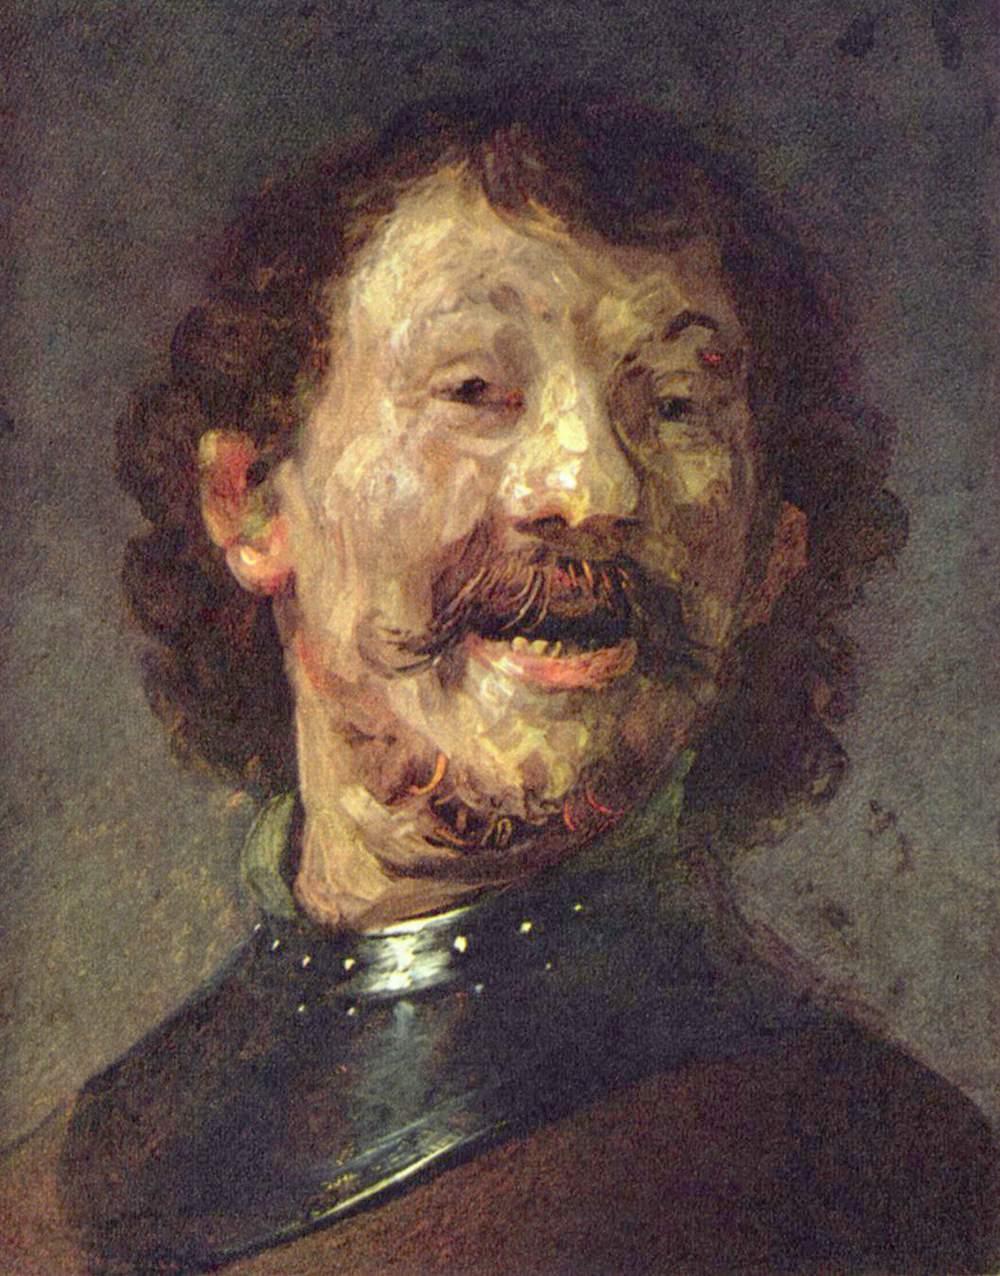 [Image: Rembrandt_Harmensz._van_Rijn_020.jpg]